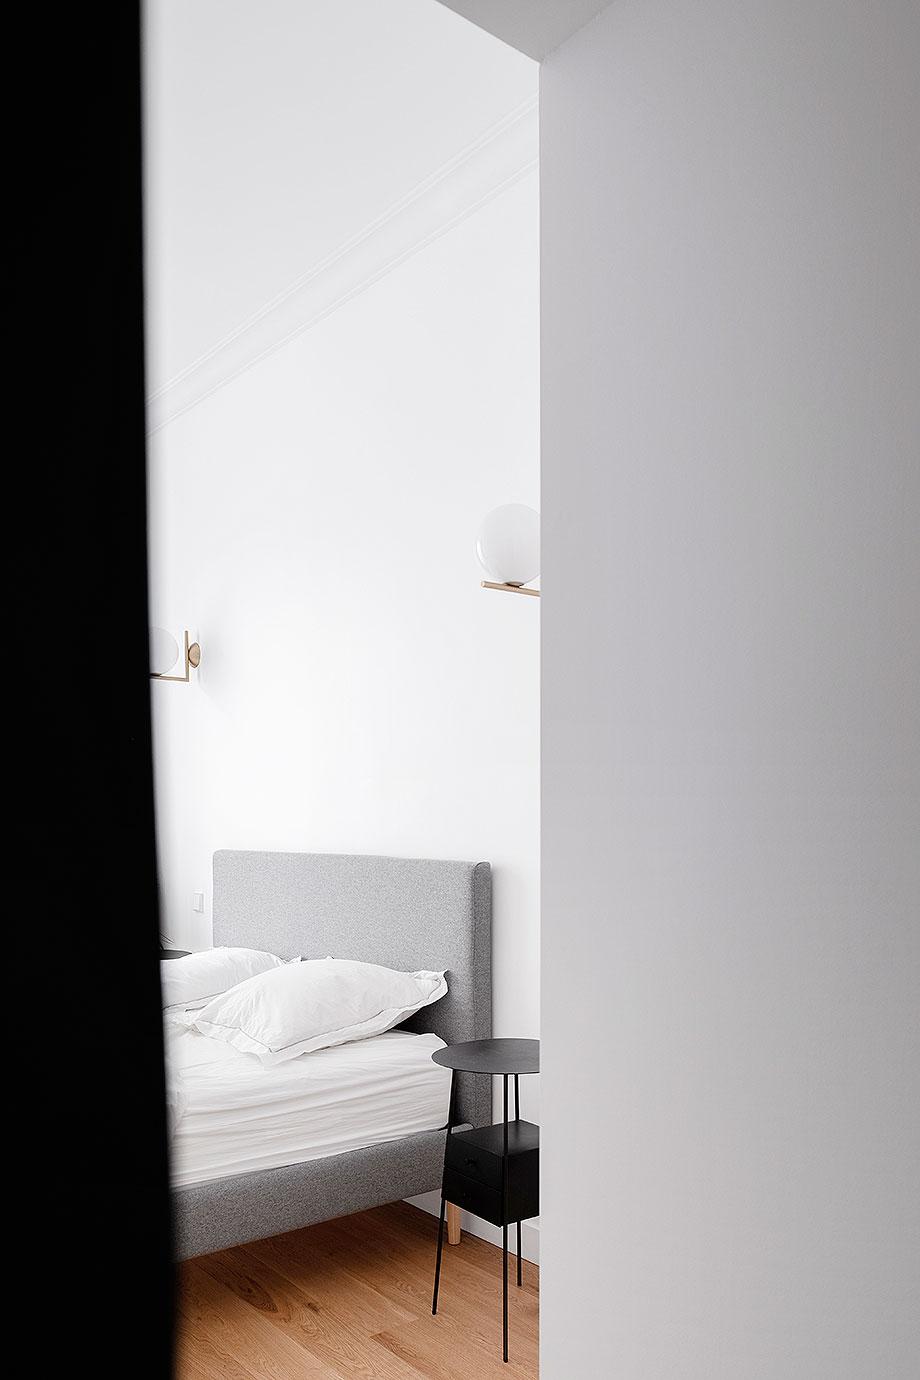 reforma integral de un apartamento en paris por anthropie architecture (s) (10) - foto juliette alexandre